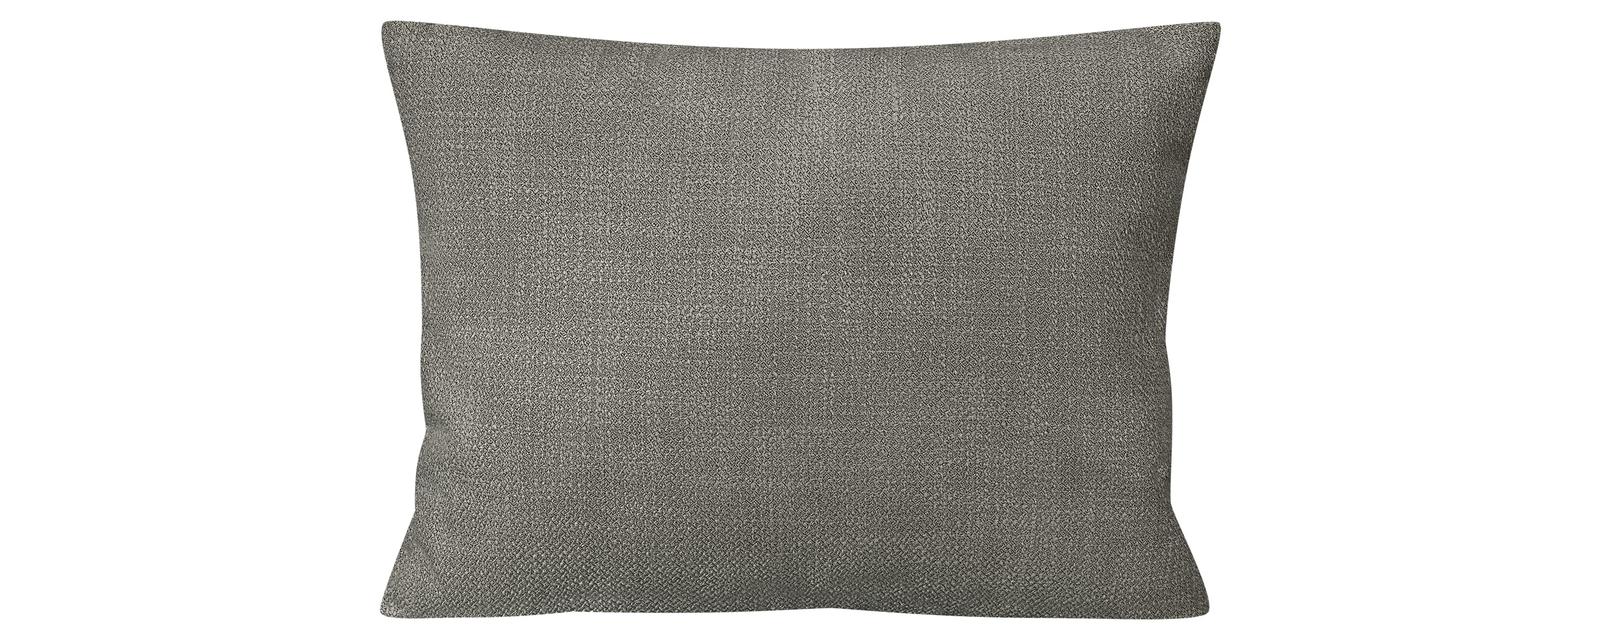 Декоративная подушка Портленд 60х48 см Nobilia серый (Рогожка) HomeMe